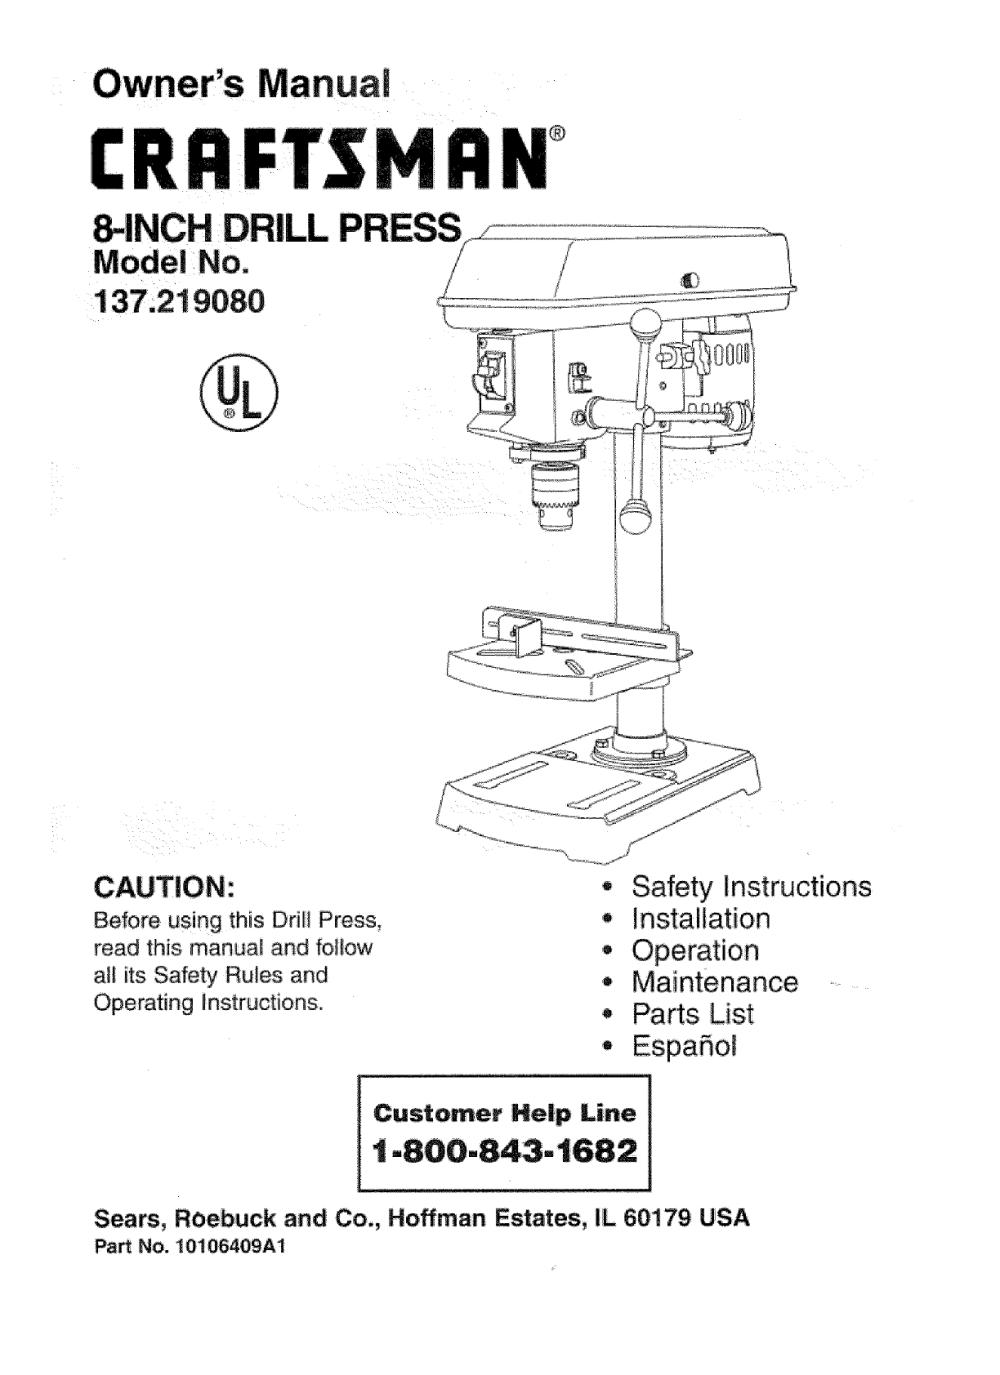 medium resolution of craftsman 137219080 user manual 8 drill press manuals and guides l0707388